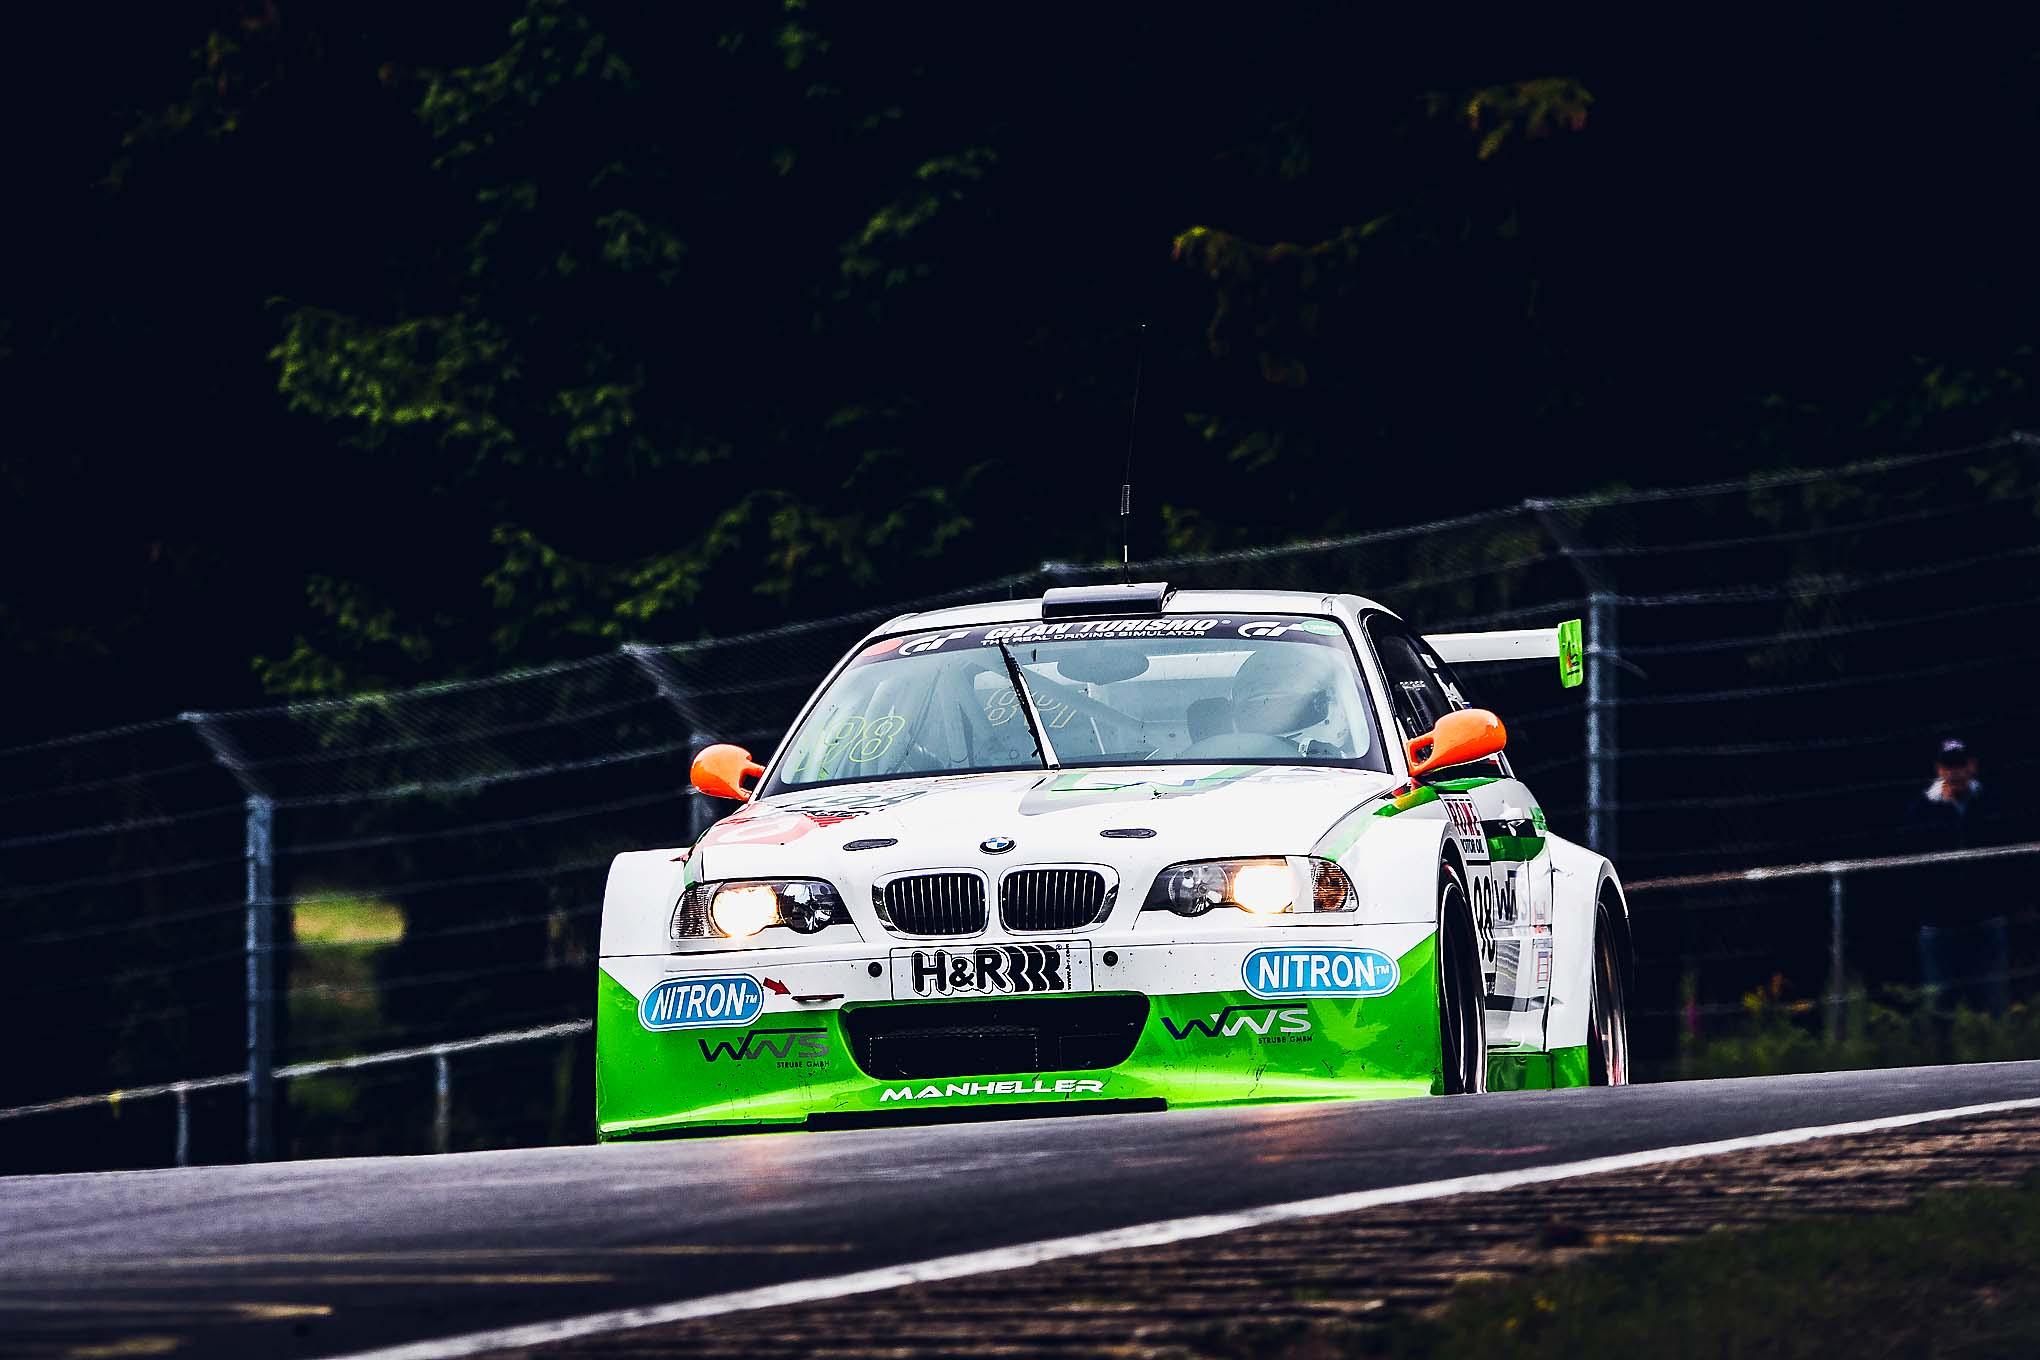 Manheller Racing WWS BMW